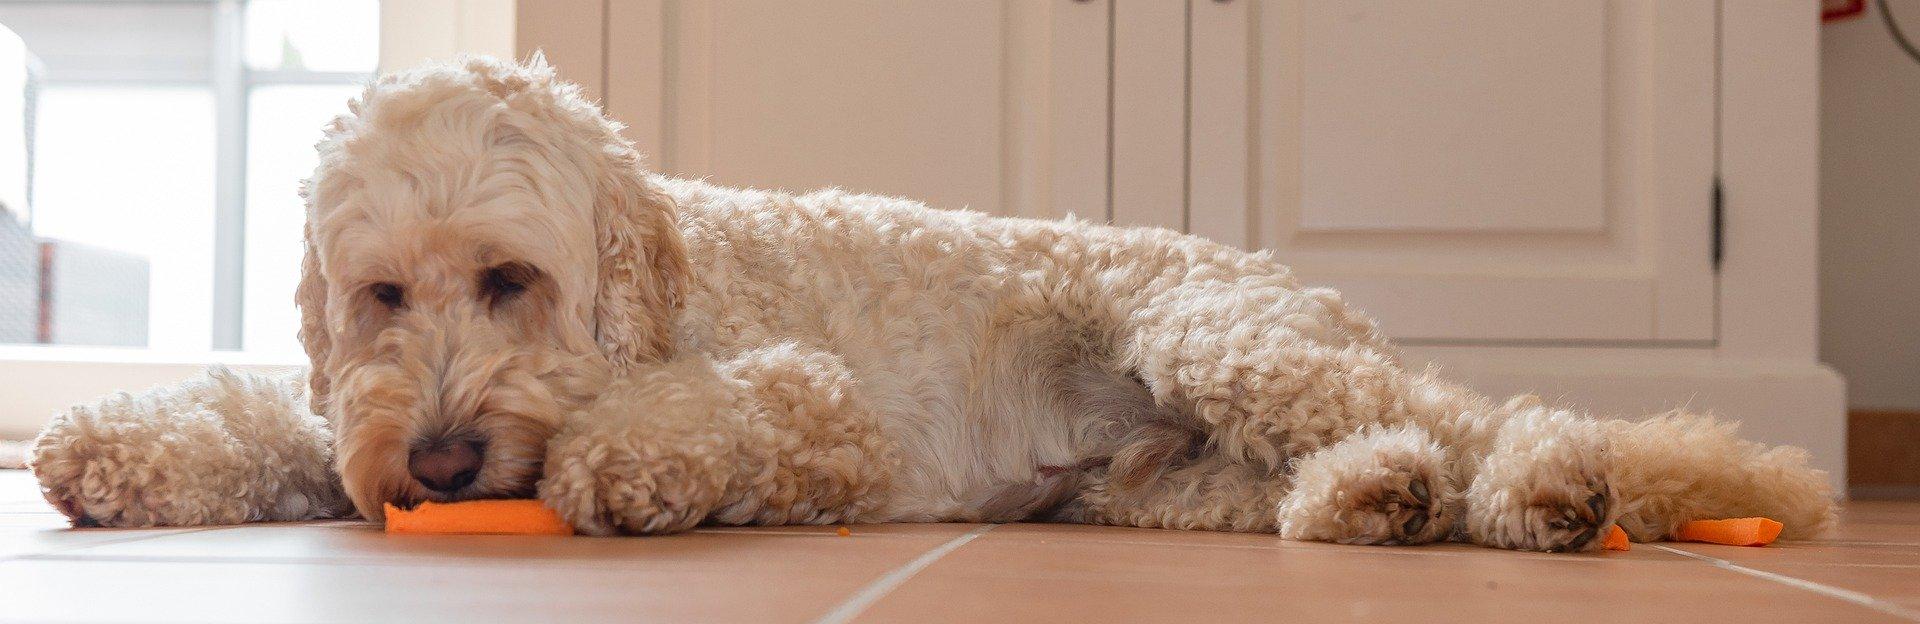 dog laying down munching on carrots